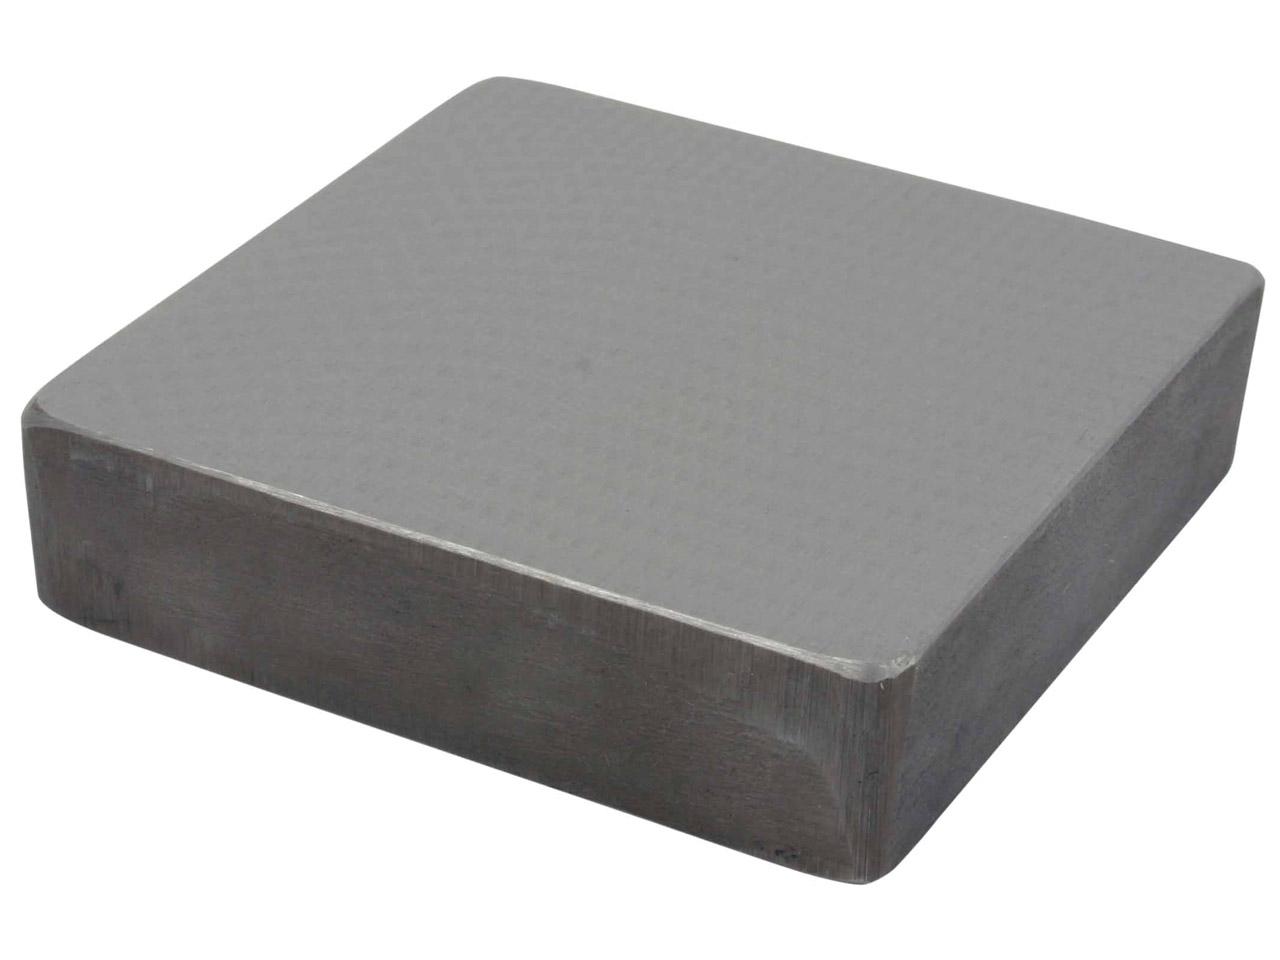 Steel Bench Block 8cm X 8cm